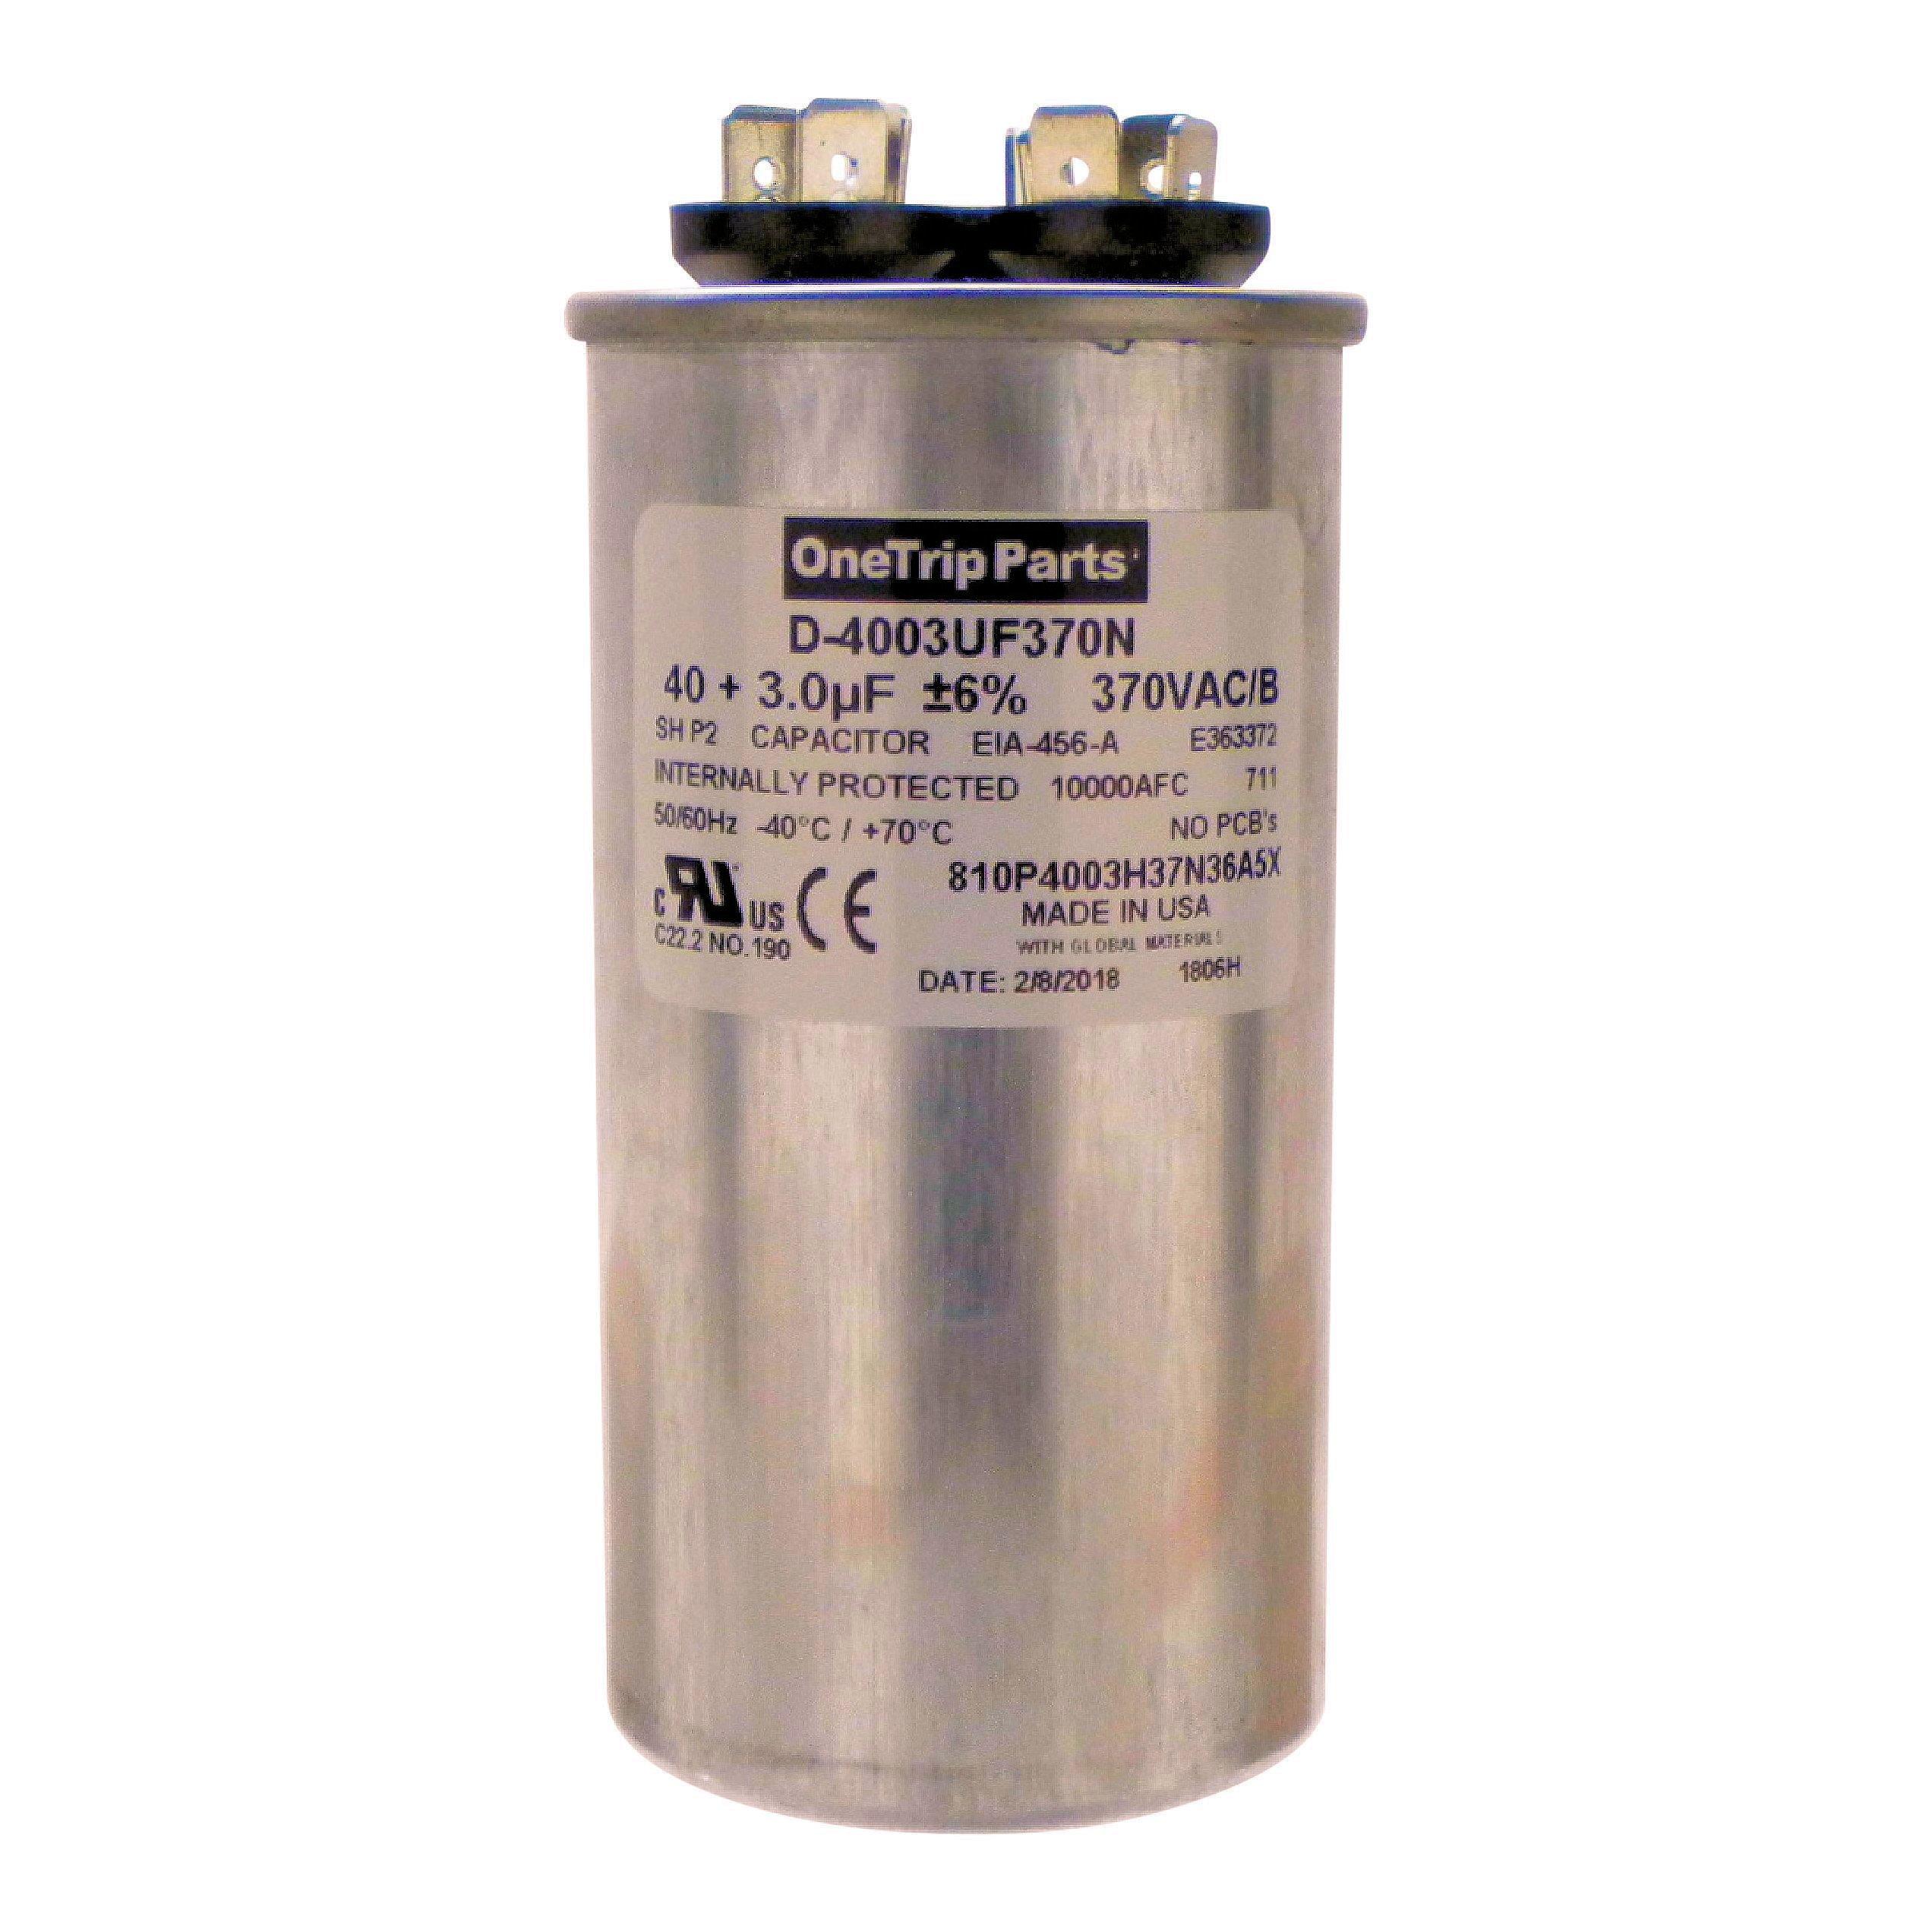 OneTrip Parts USA Run Capacitor 40+3 UF 40/3 MFD 370 VAC 2'' Round